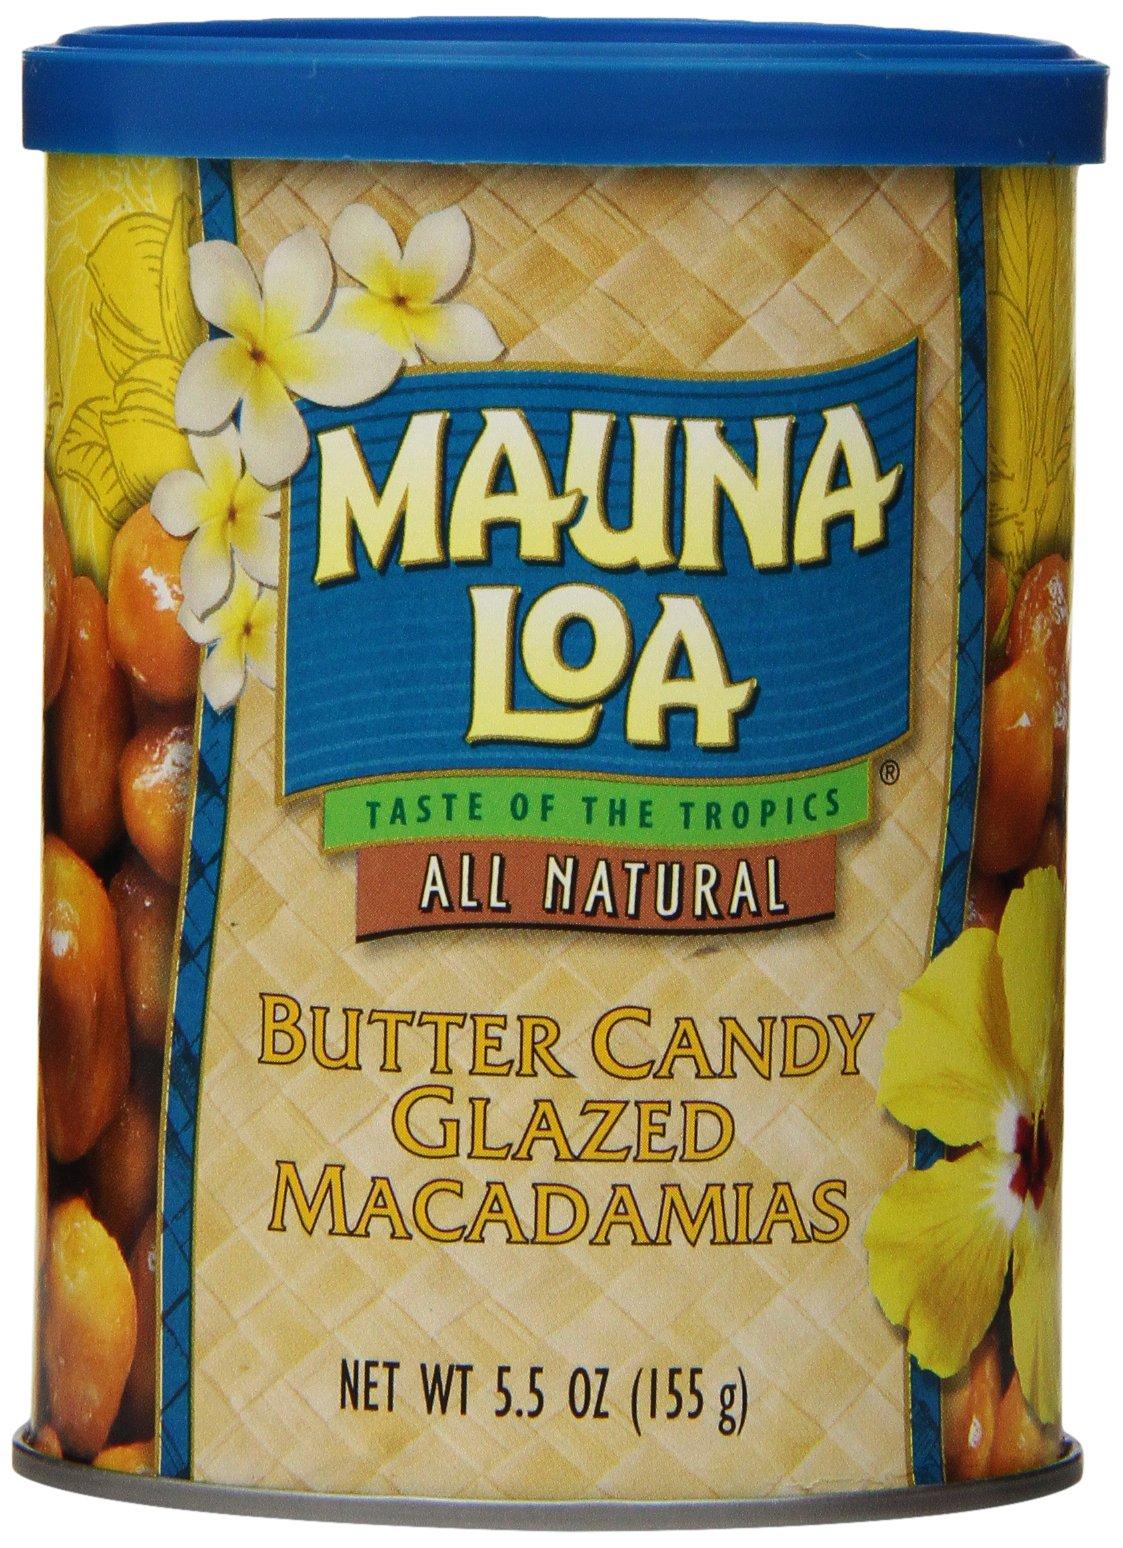 Mauna Loa Macadamias, Butter Candy Glazed, 5.5 Ounce Containers